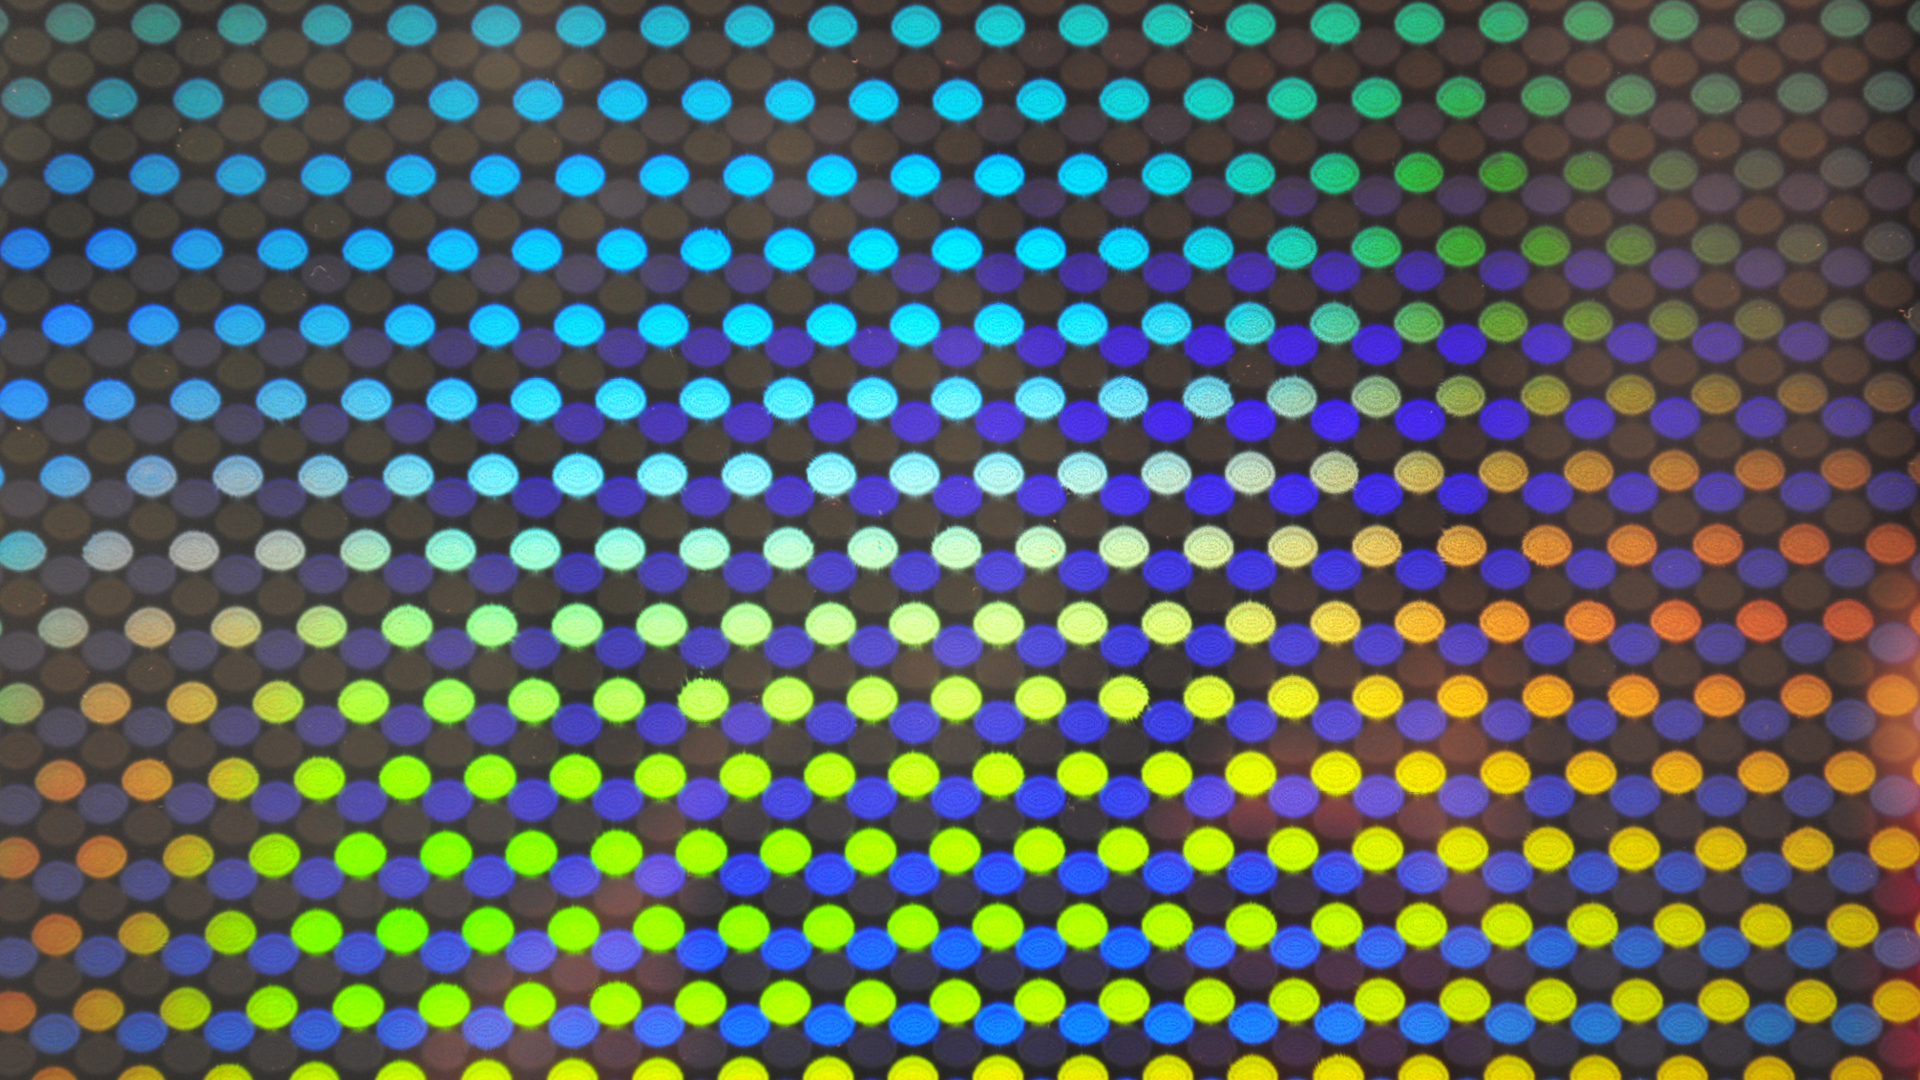 Dieter Jung swings between optics and kinetics in this hi-tech driven show